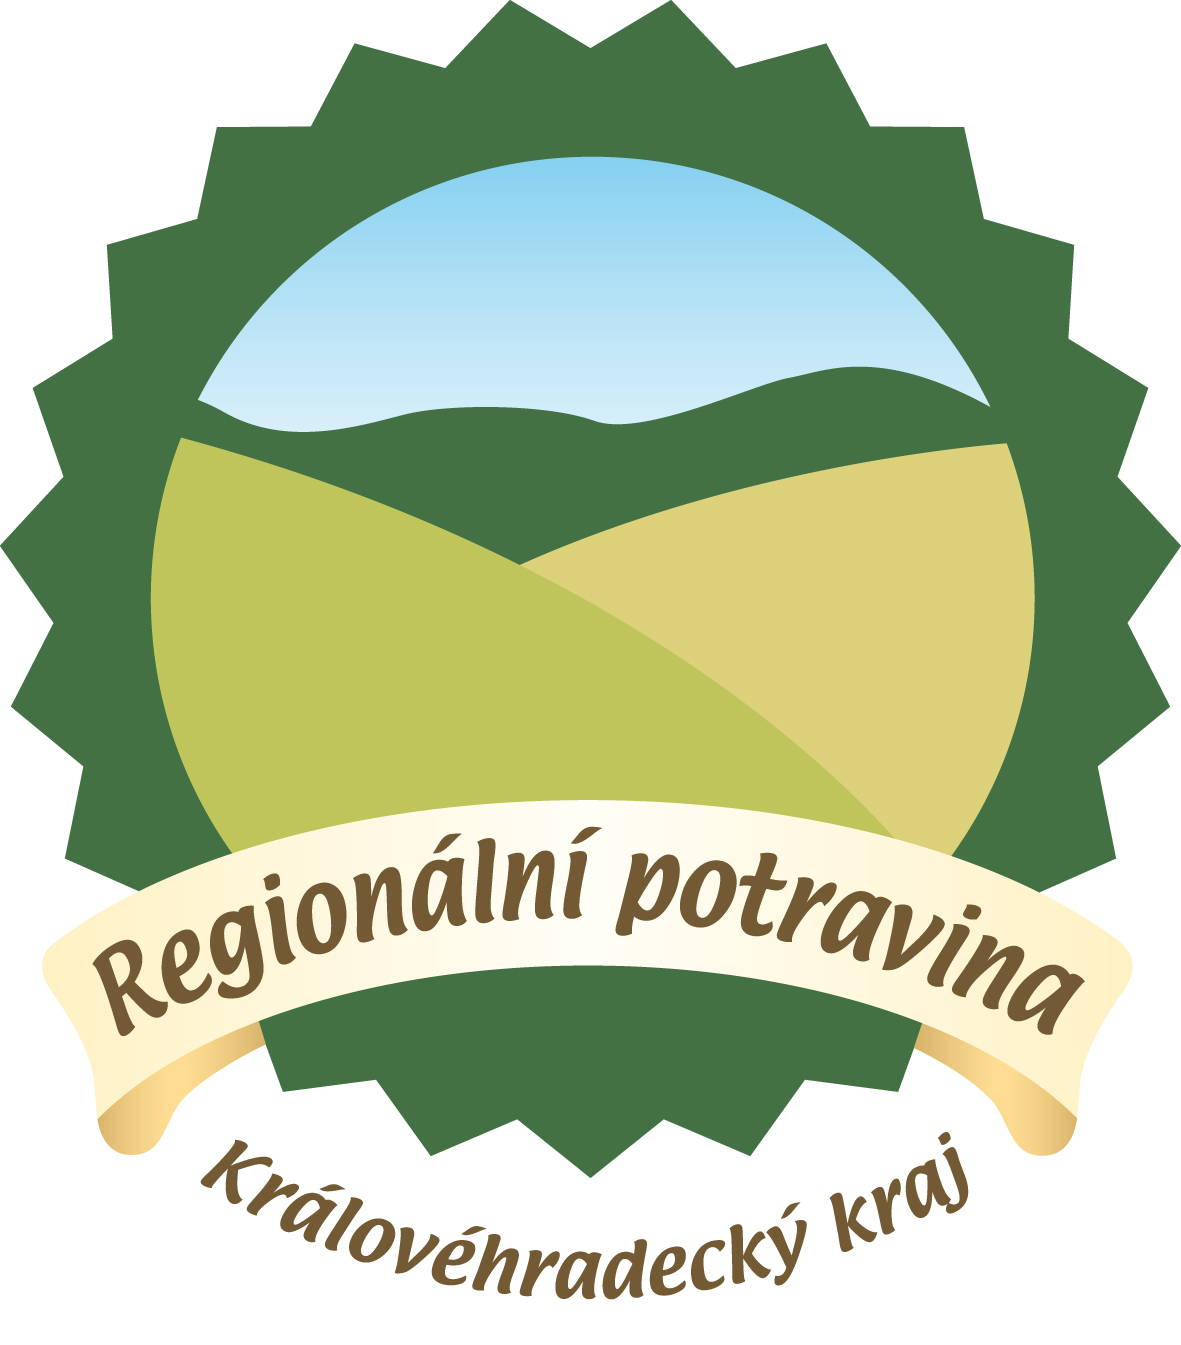 http://primator.cz/wp-content/uploads/2018/02/logo-regionalni-potravina-KRK.jpg